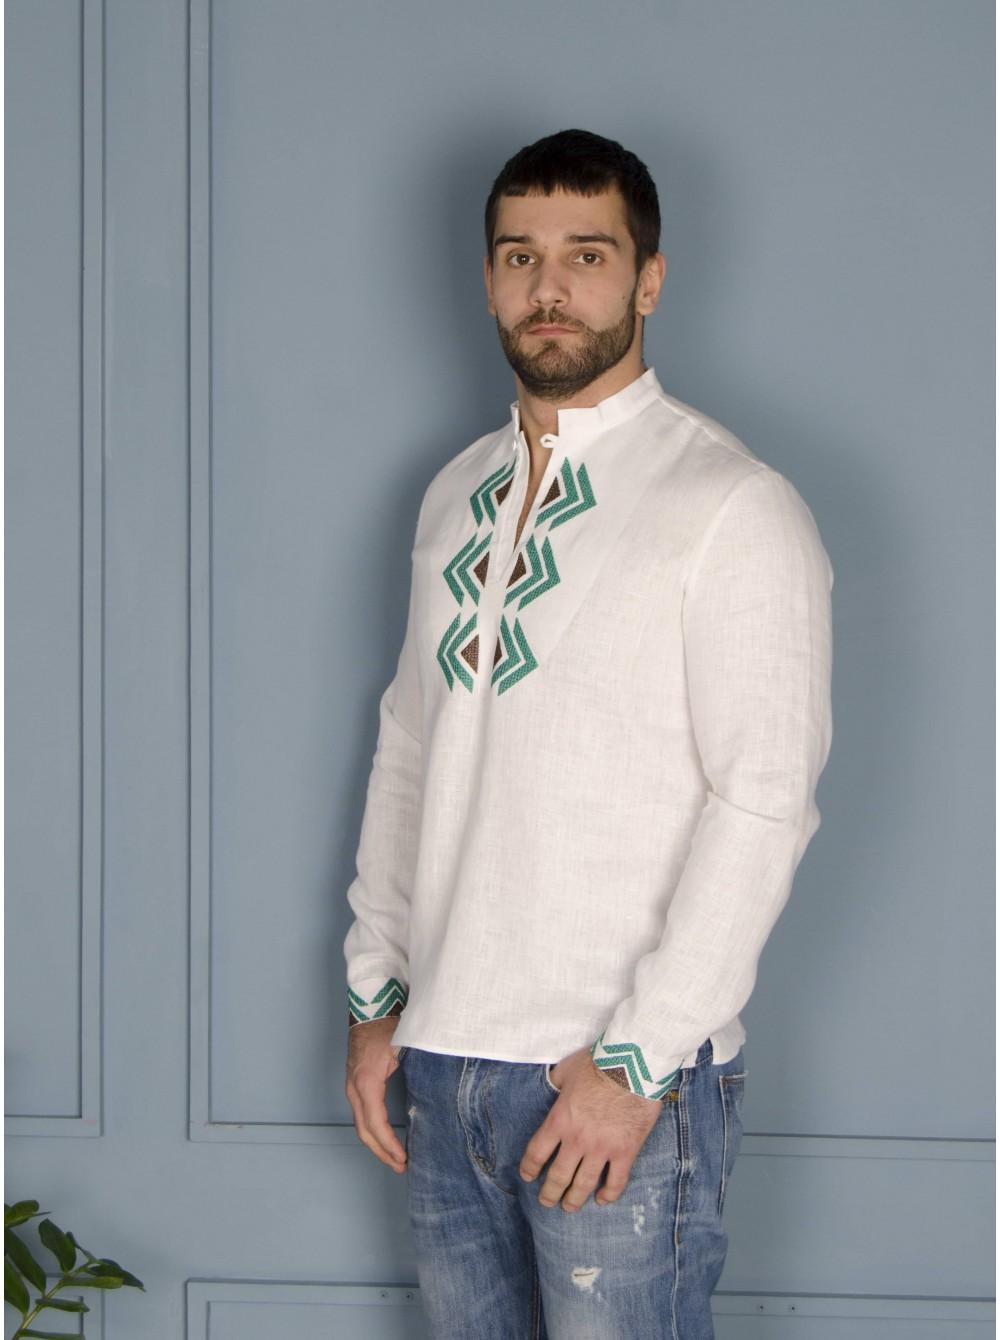 5645bae77f18c3 Чоловіча вишиванка з зеленою вишивкою - etno-vyshyvanka.com